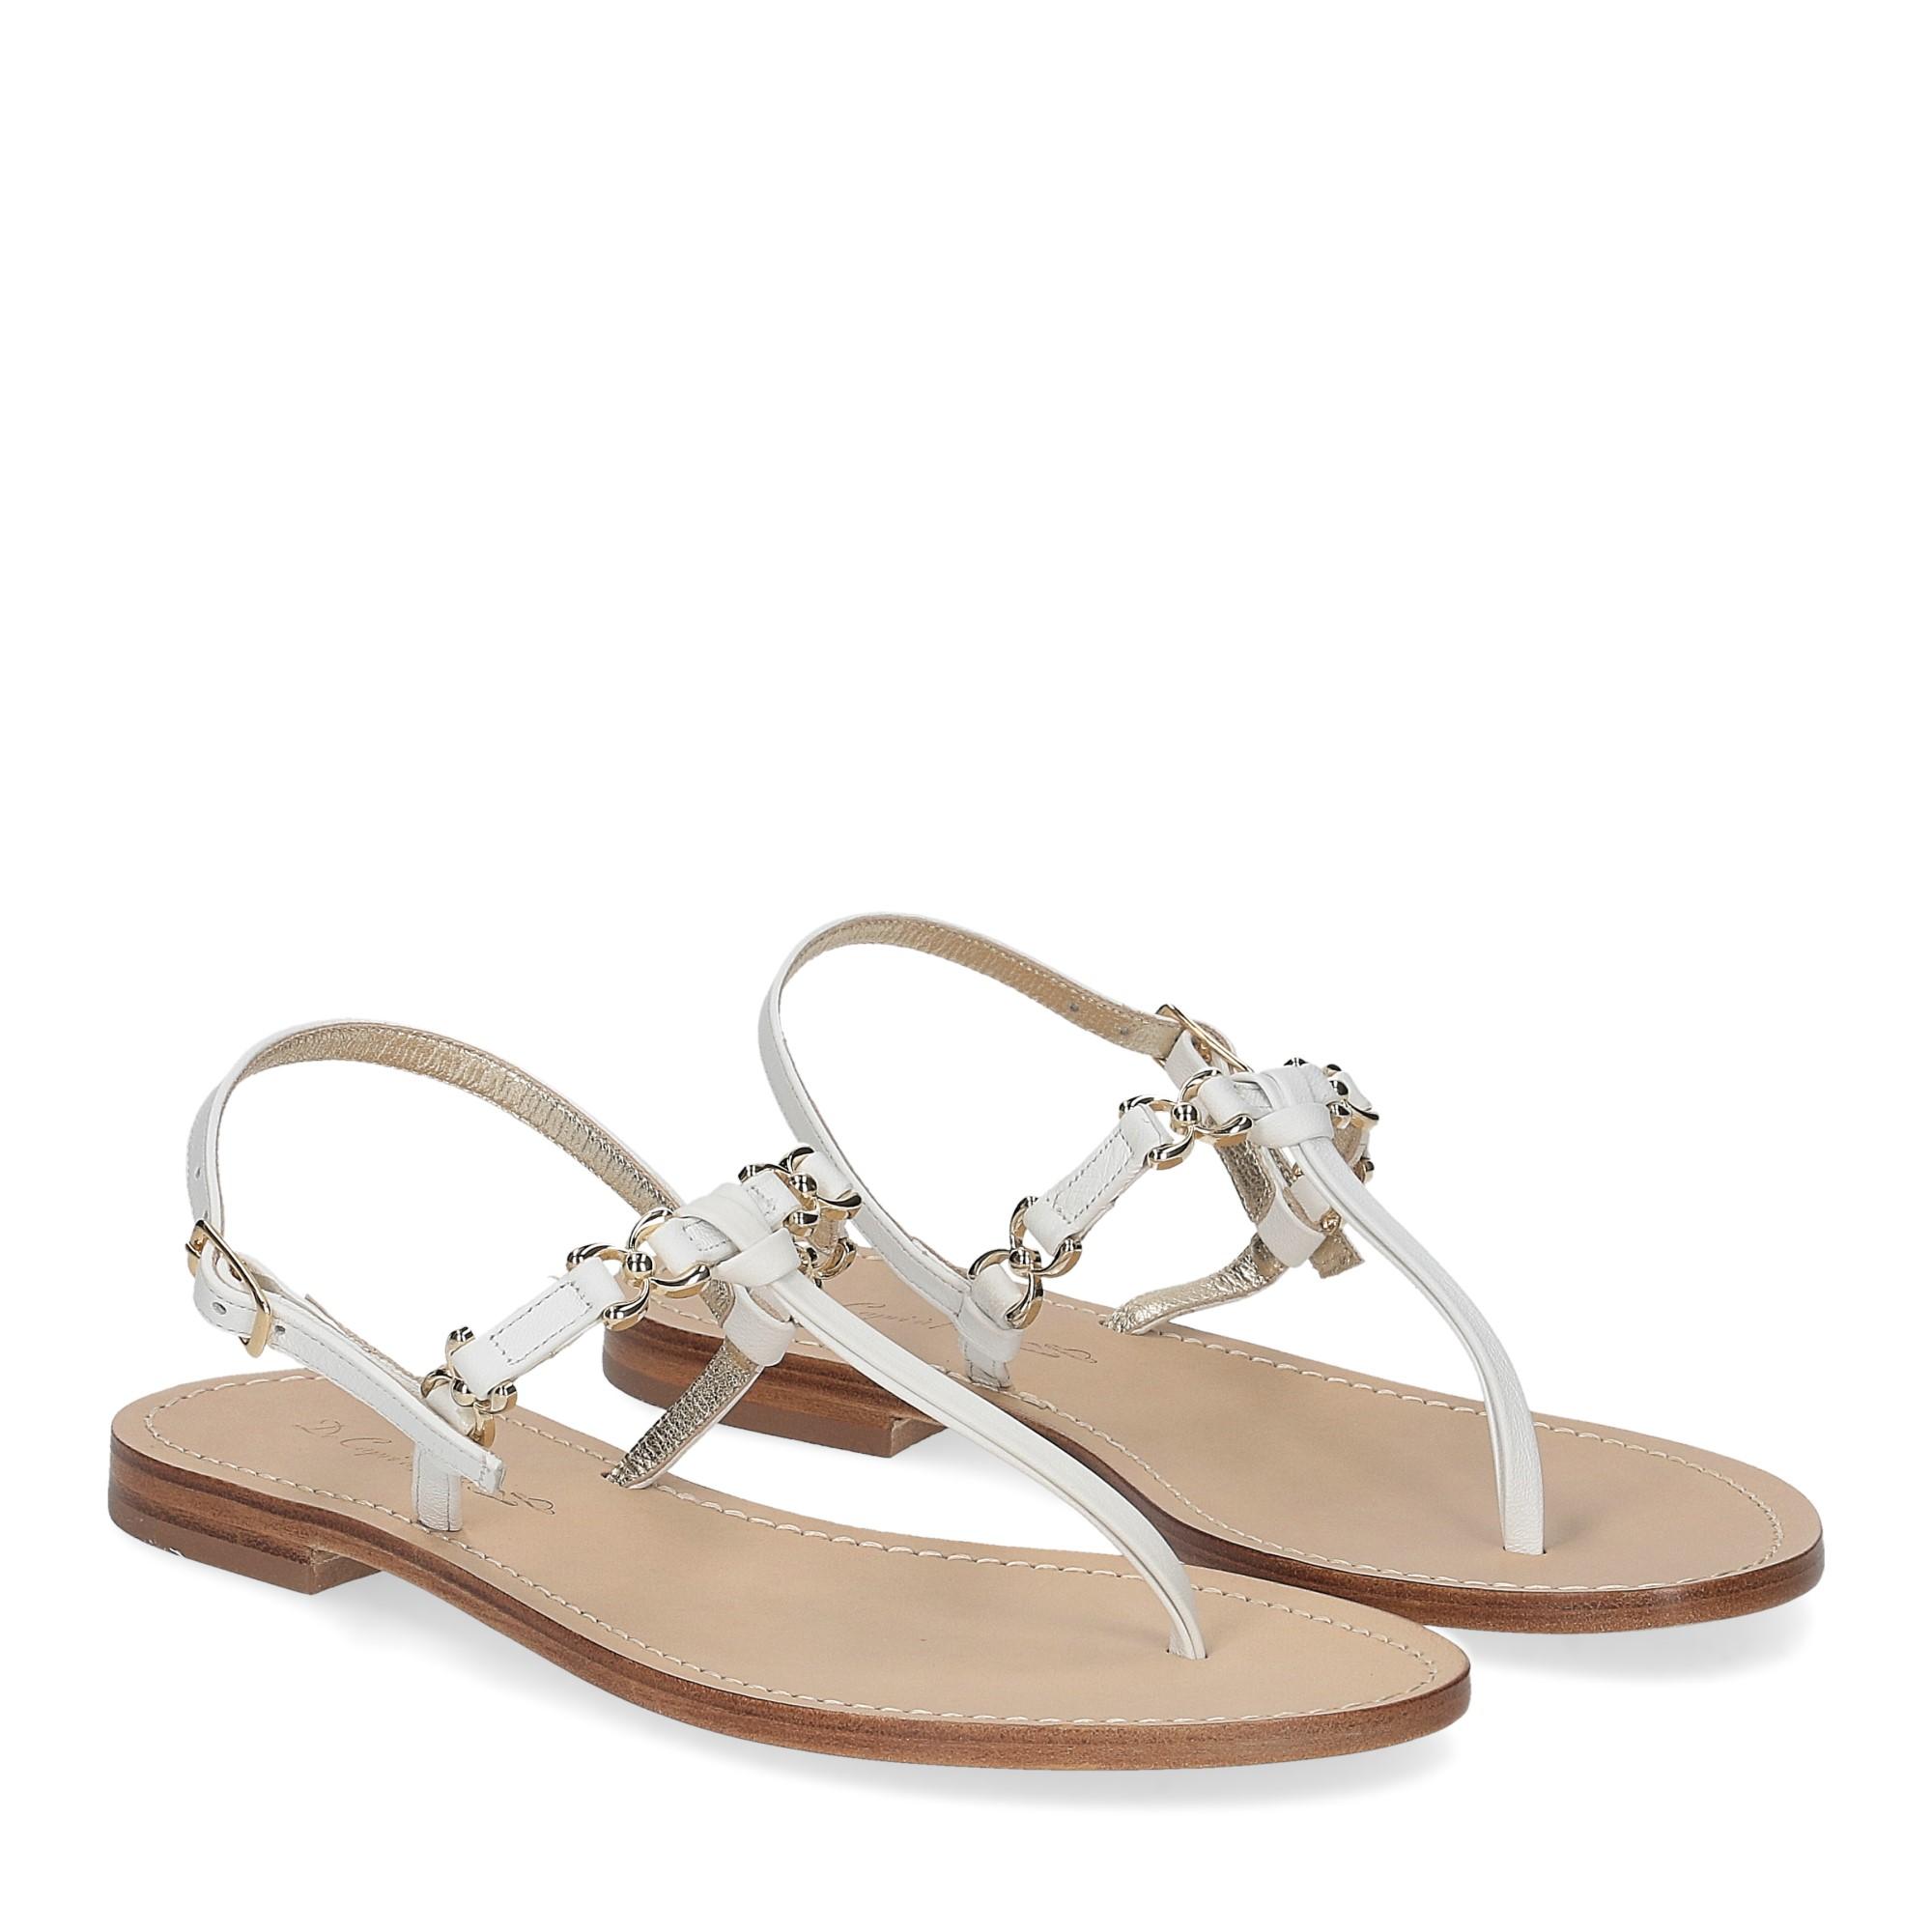 De Capri a Paris sandalo infradito nodino pelle bianca